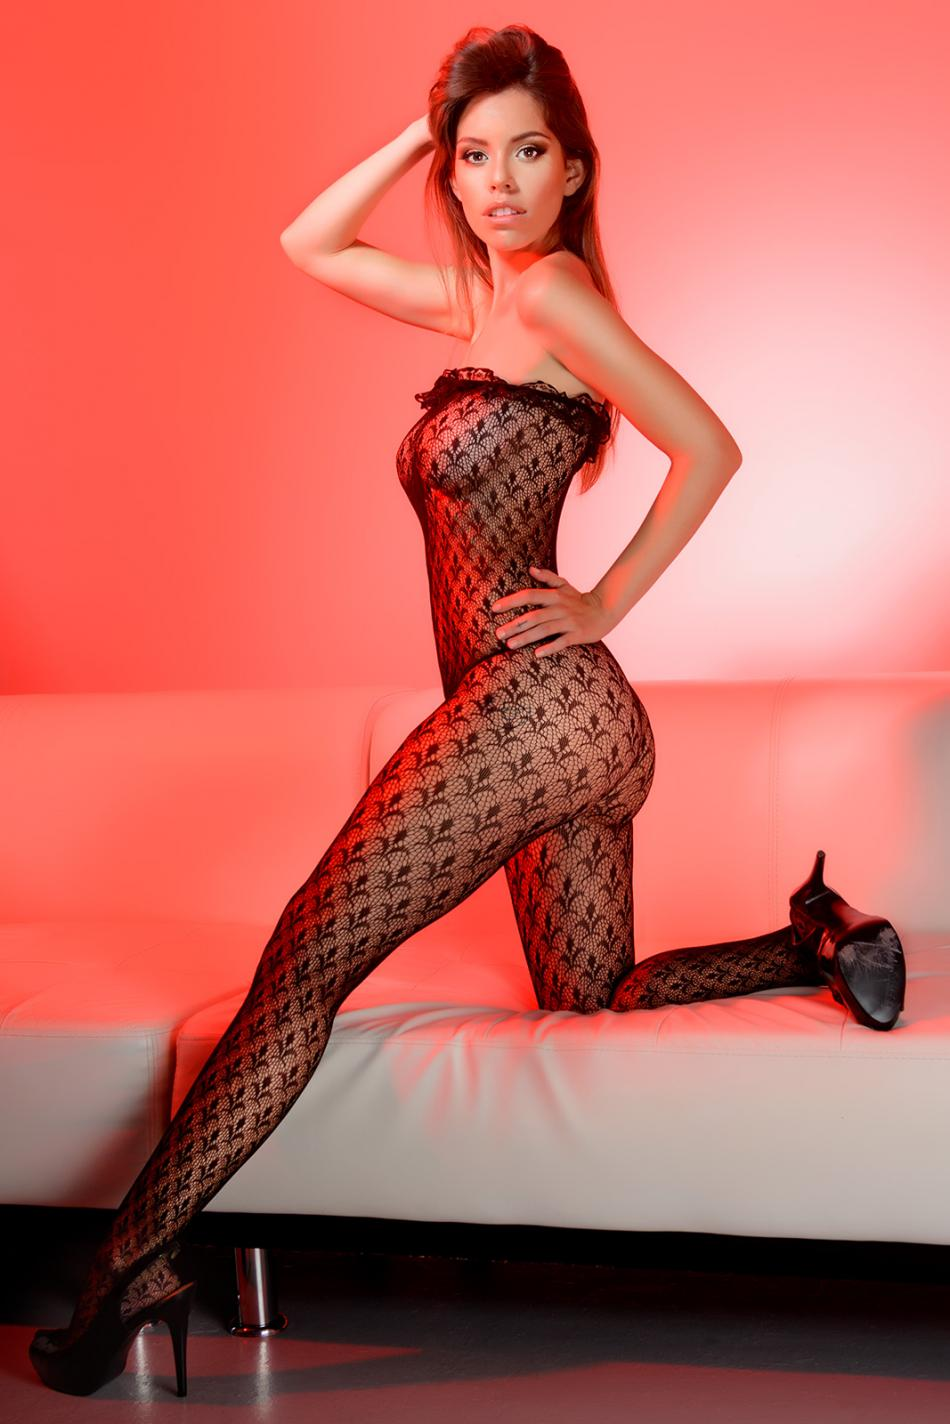 Ladyfordaddy.com Erika Girl In New York 11065425 - 4 4